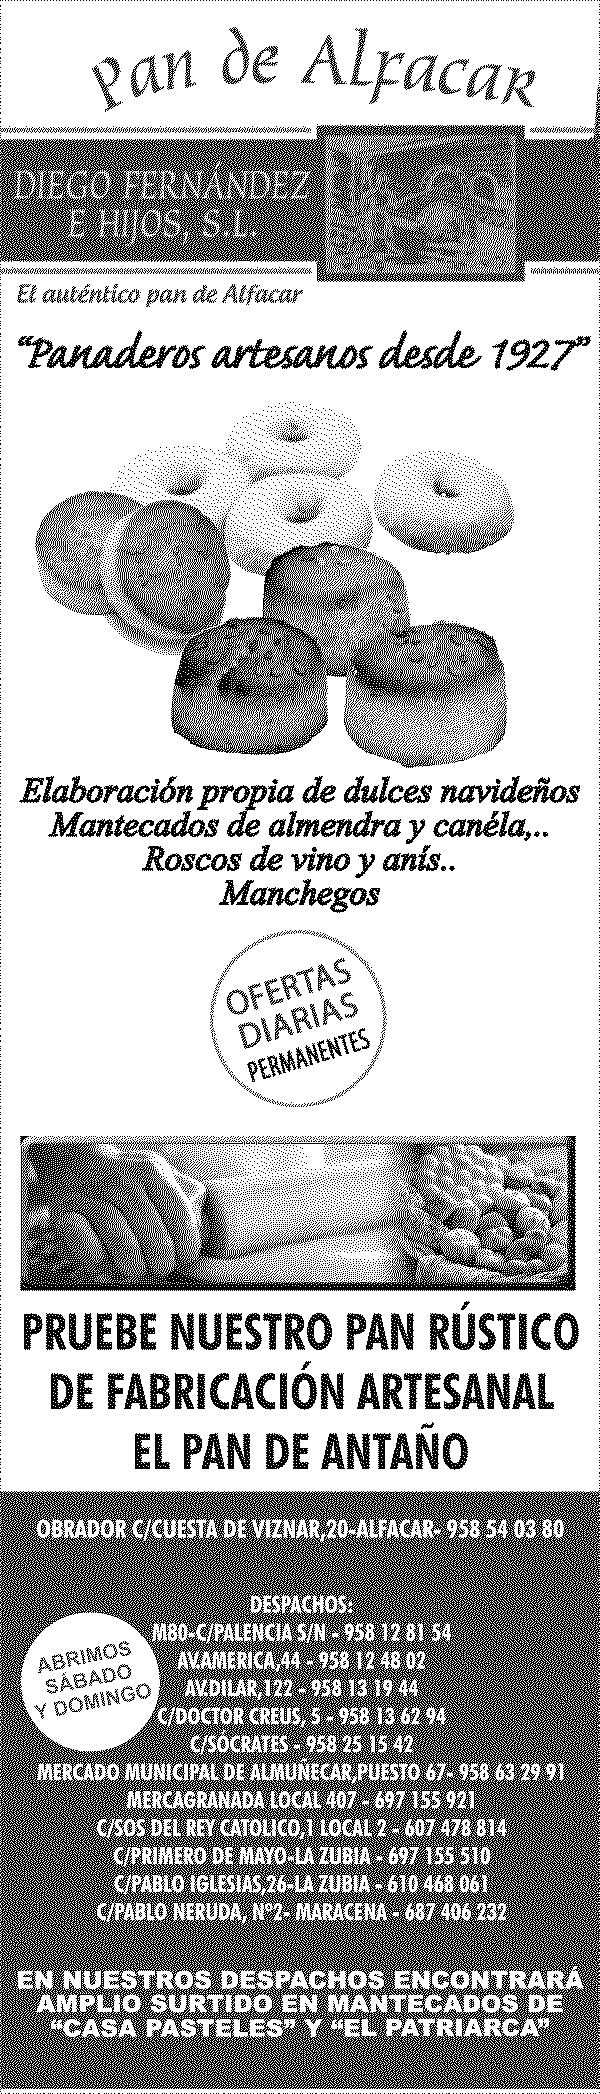 10X2 DIEGO FERNANDEZ NAVIDAD